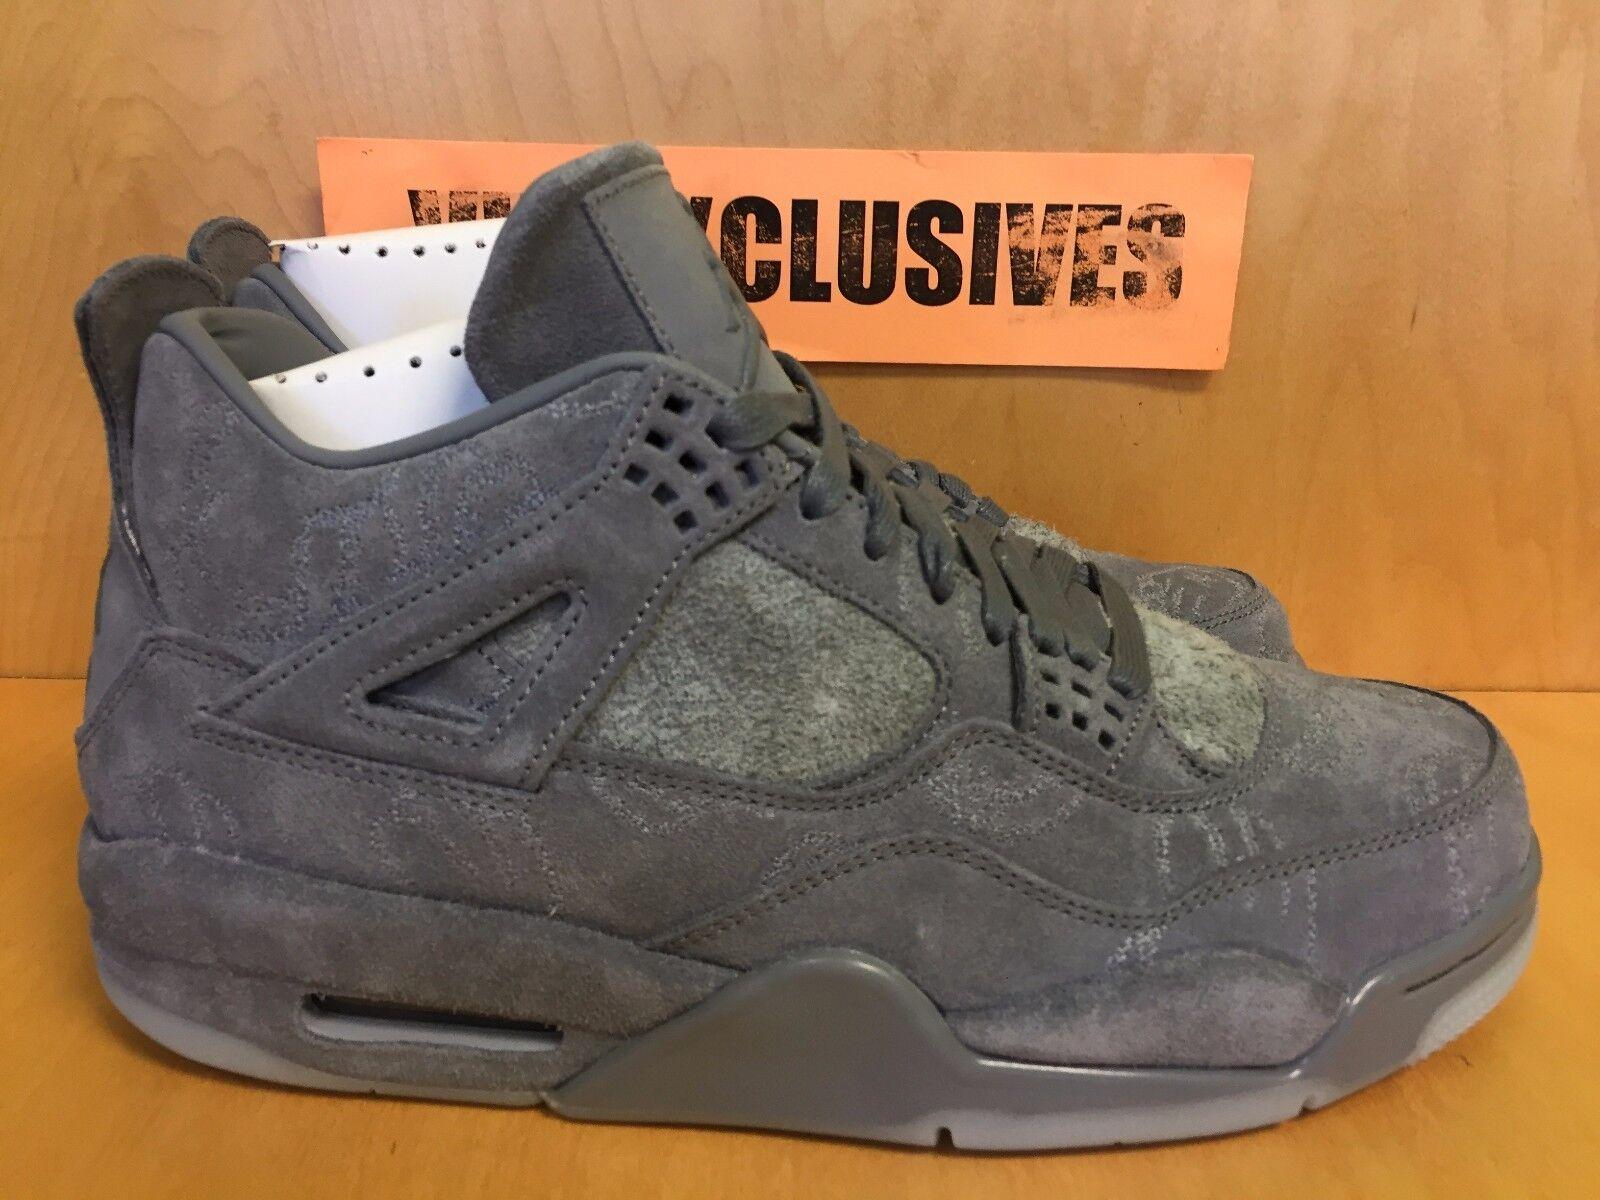 best sneakers a9cd3 bec72 Nike Air Jordan IV Retro 4 x Kaws Cool Grey 930155-003 SZ 8-14 SHIPPING NOW  lot